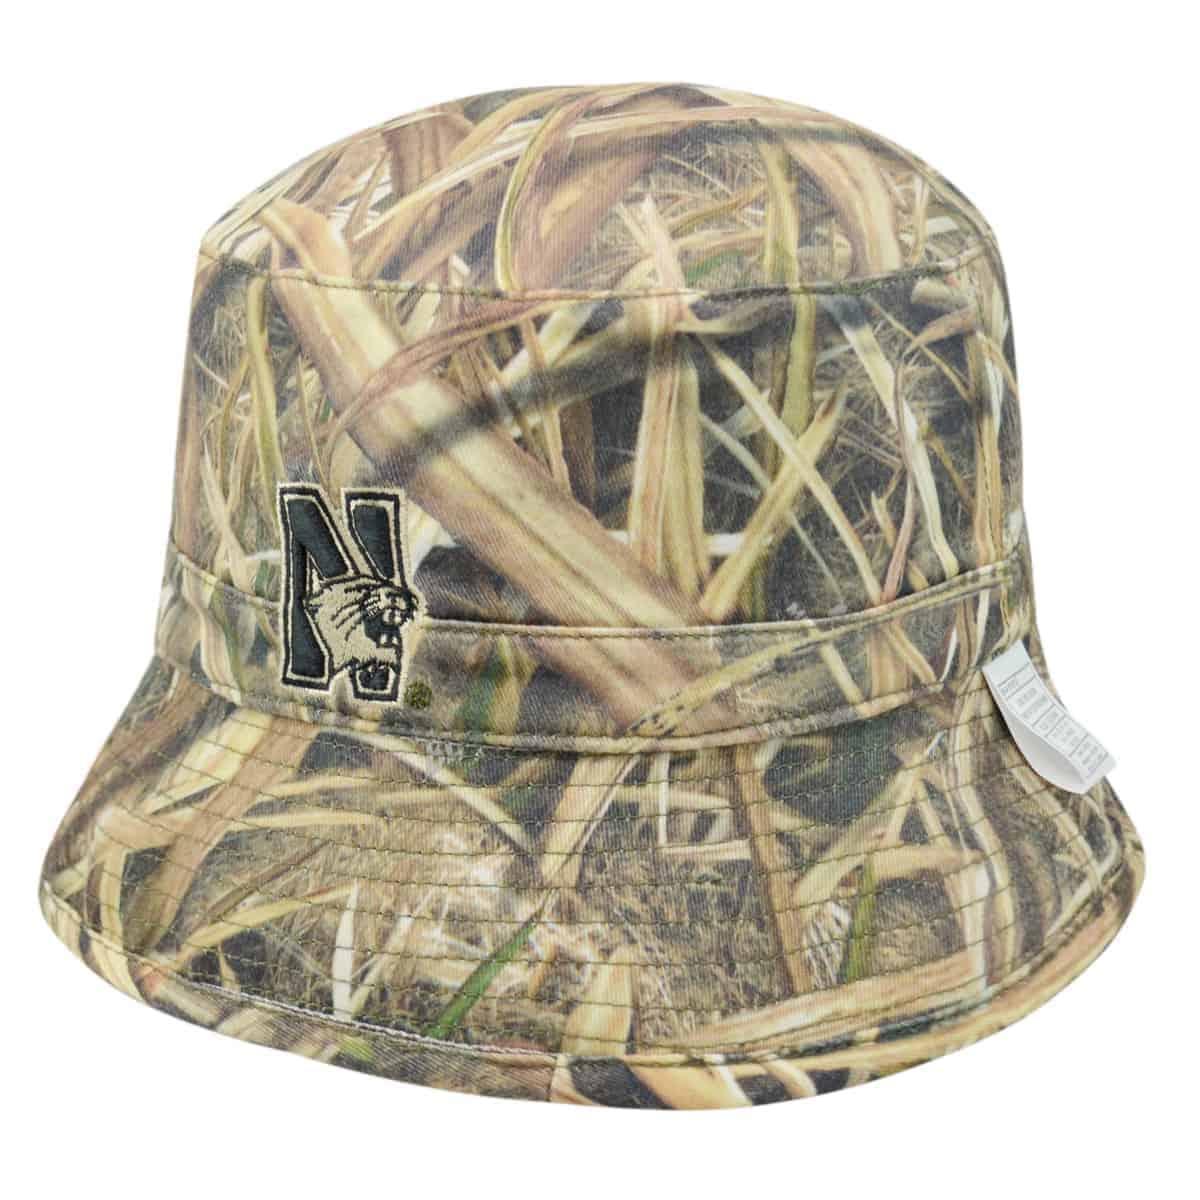 Northwestern Wildcats Camo Tan Reversible Floppy Bucket Hat with N-Cat  Design 9042bb271af